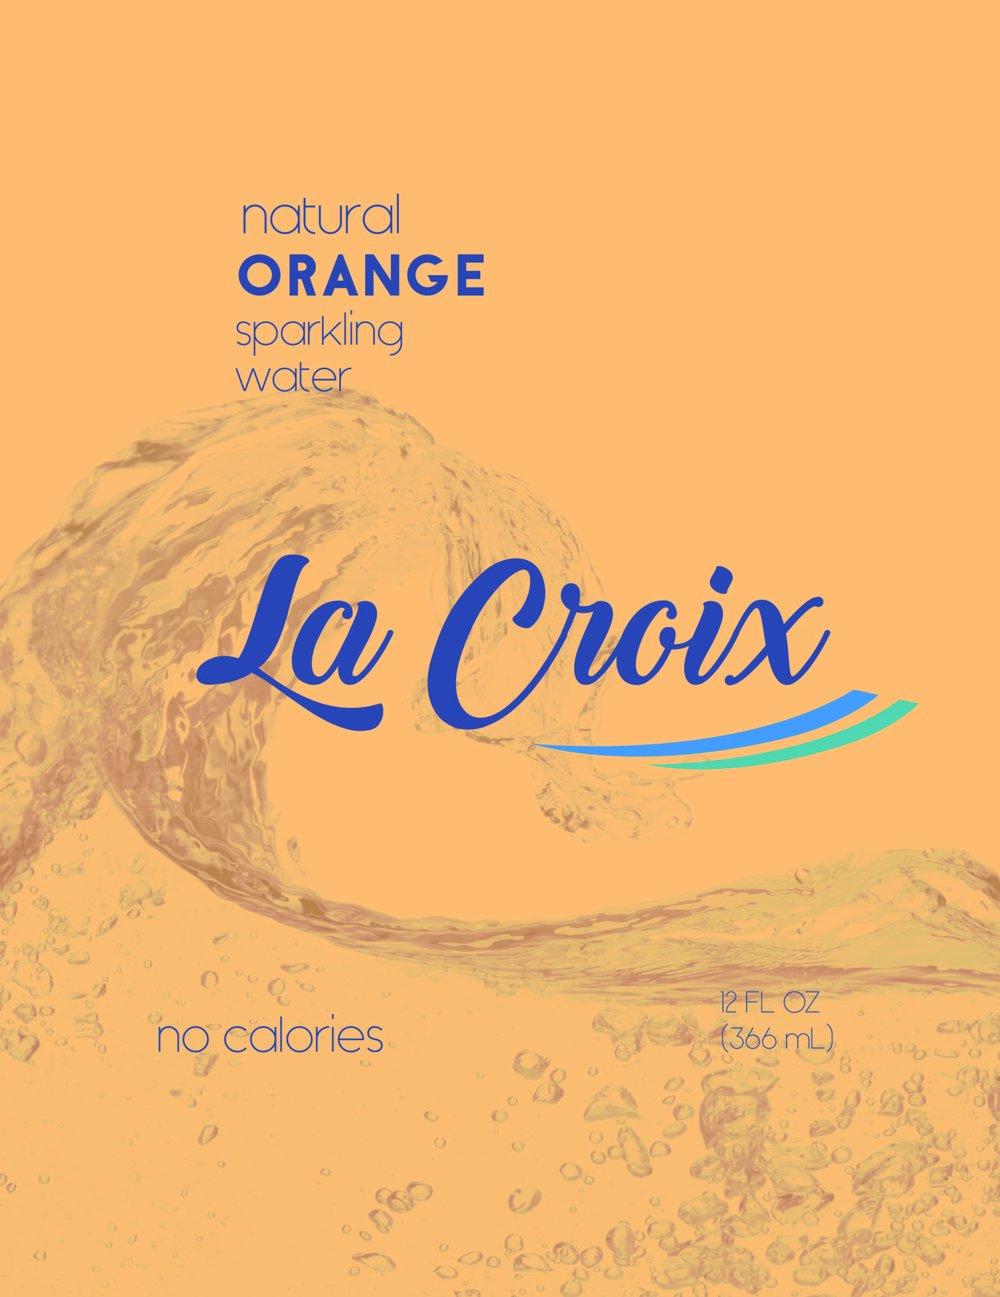 la croix orange-01.jpg